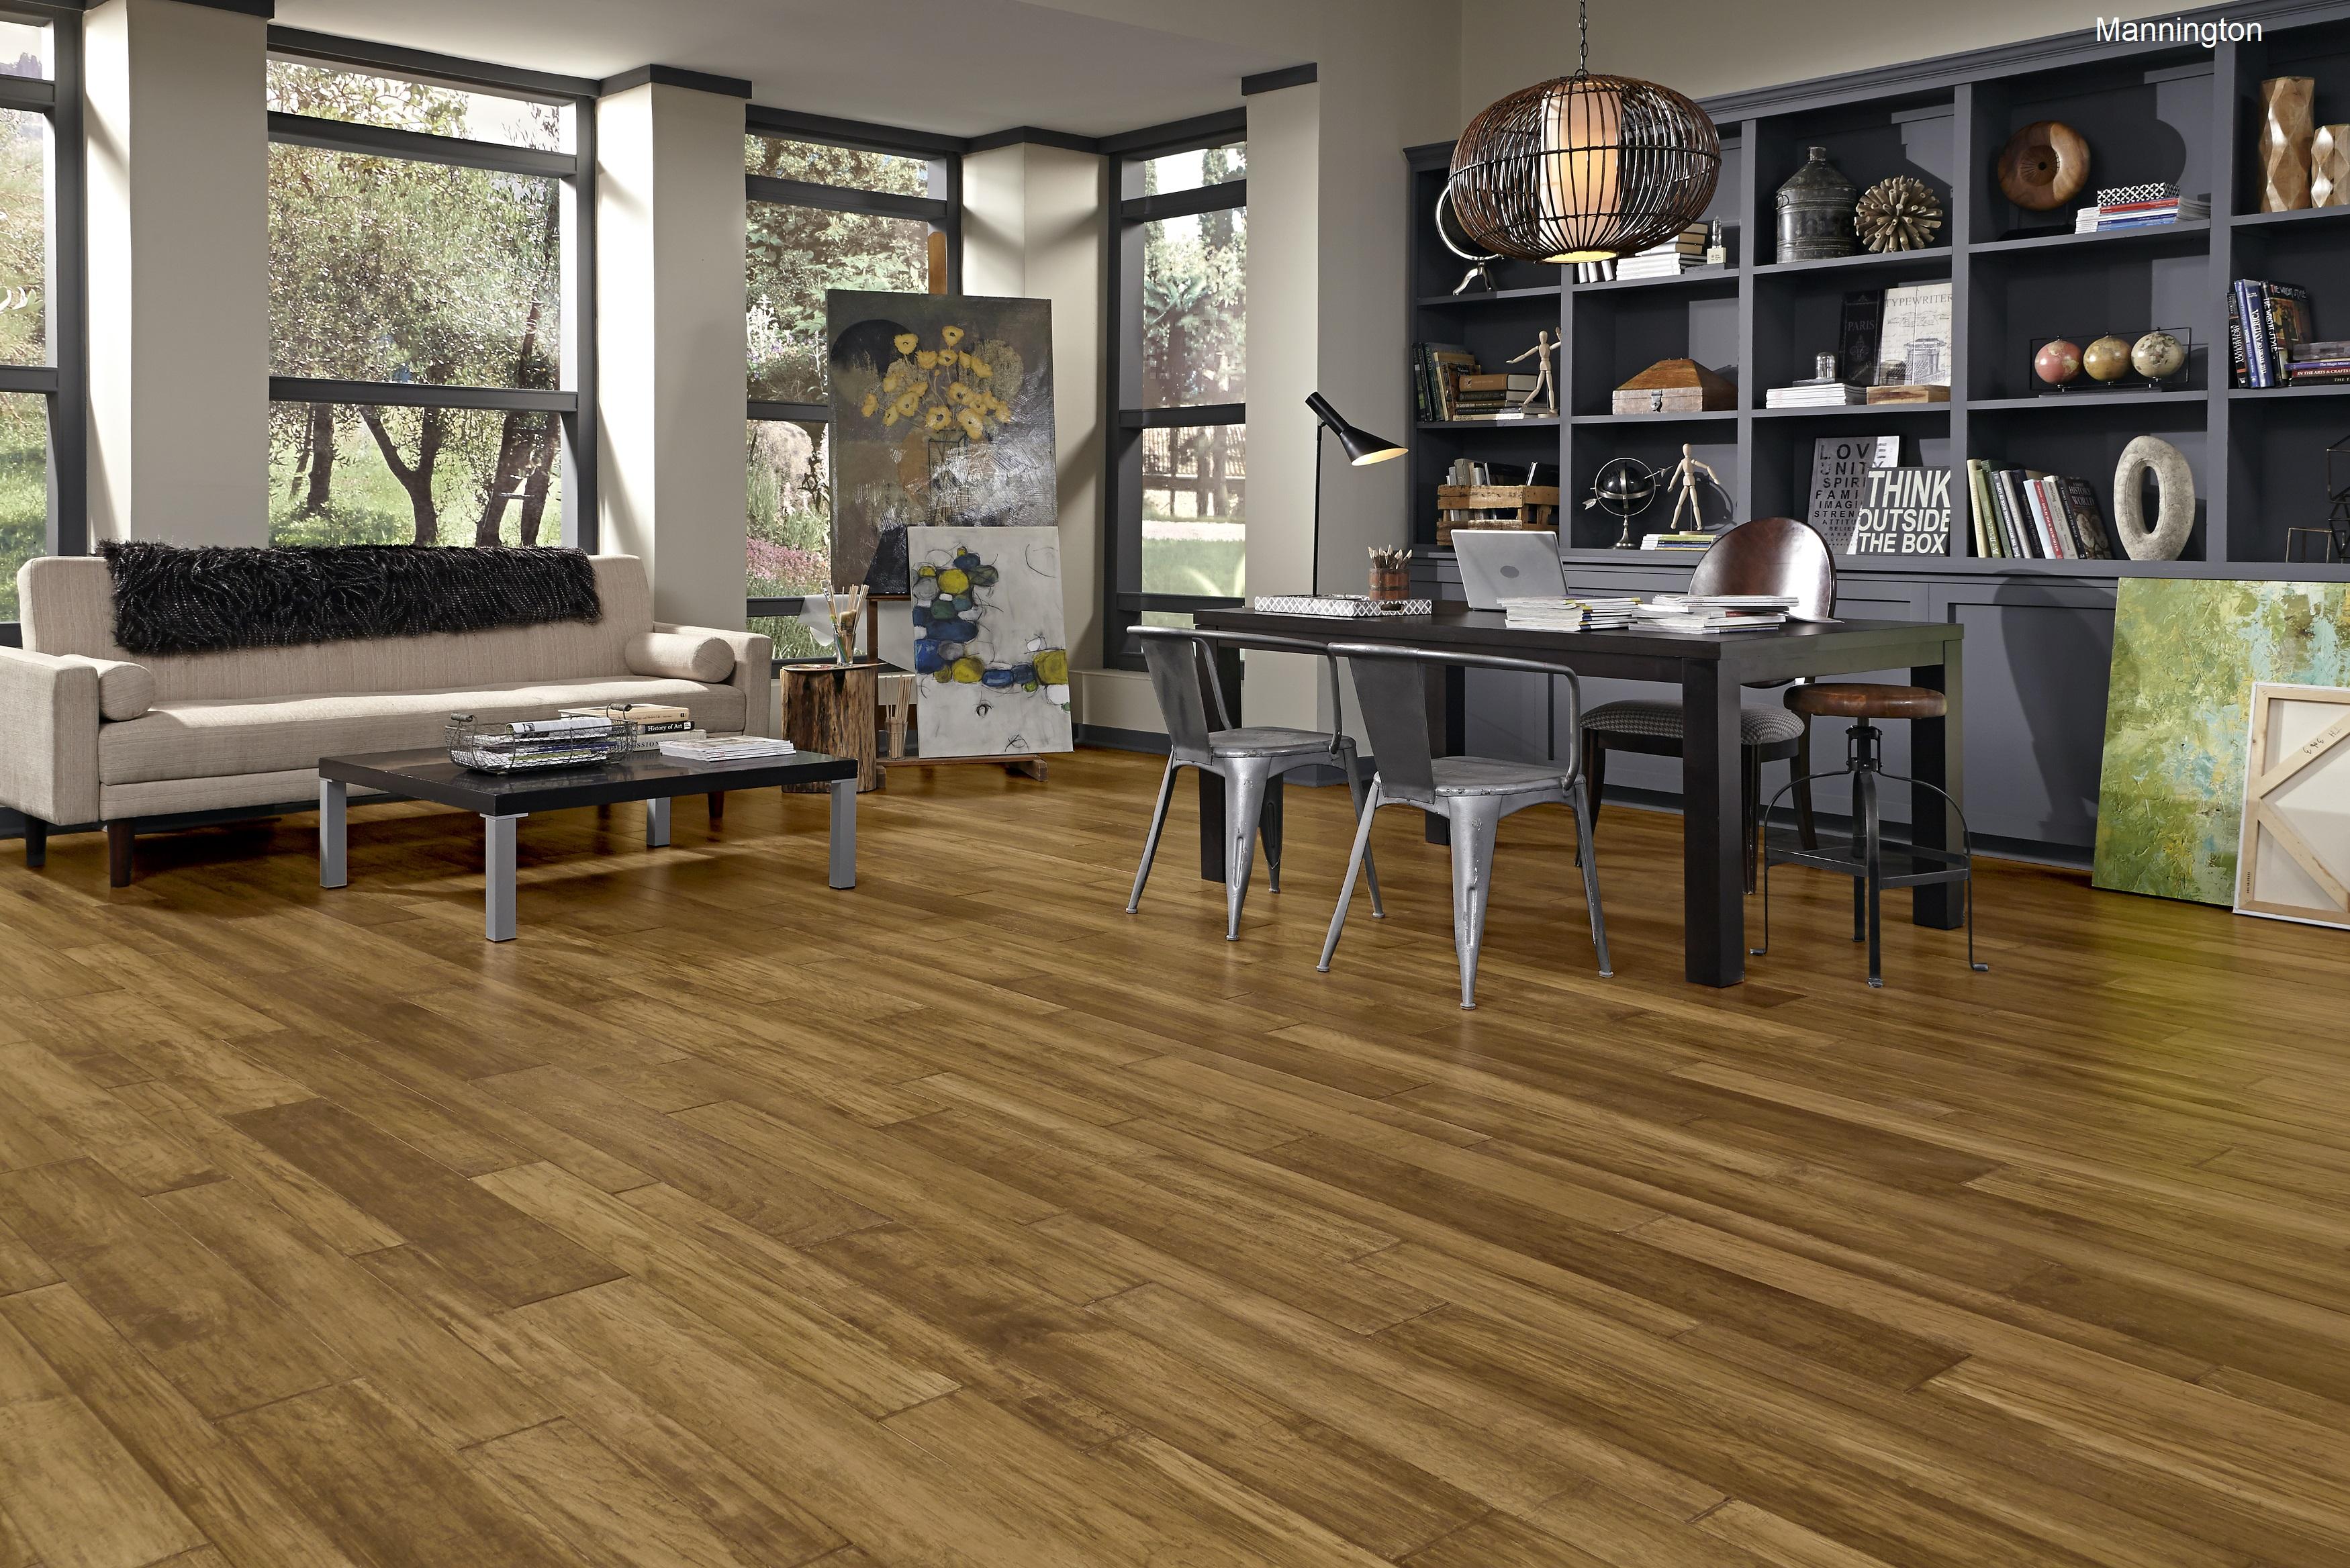 Hardwood Floors Mannington Aladdin Carpet Your Local